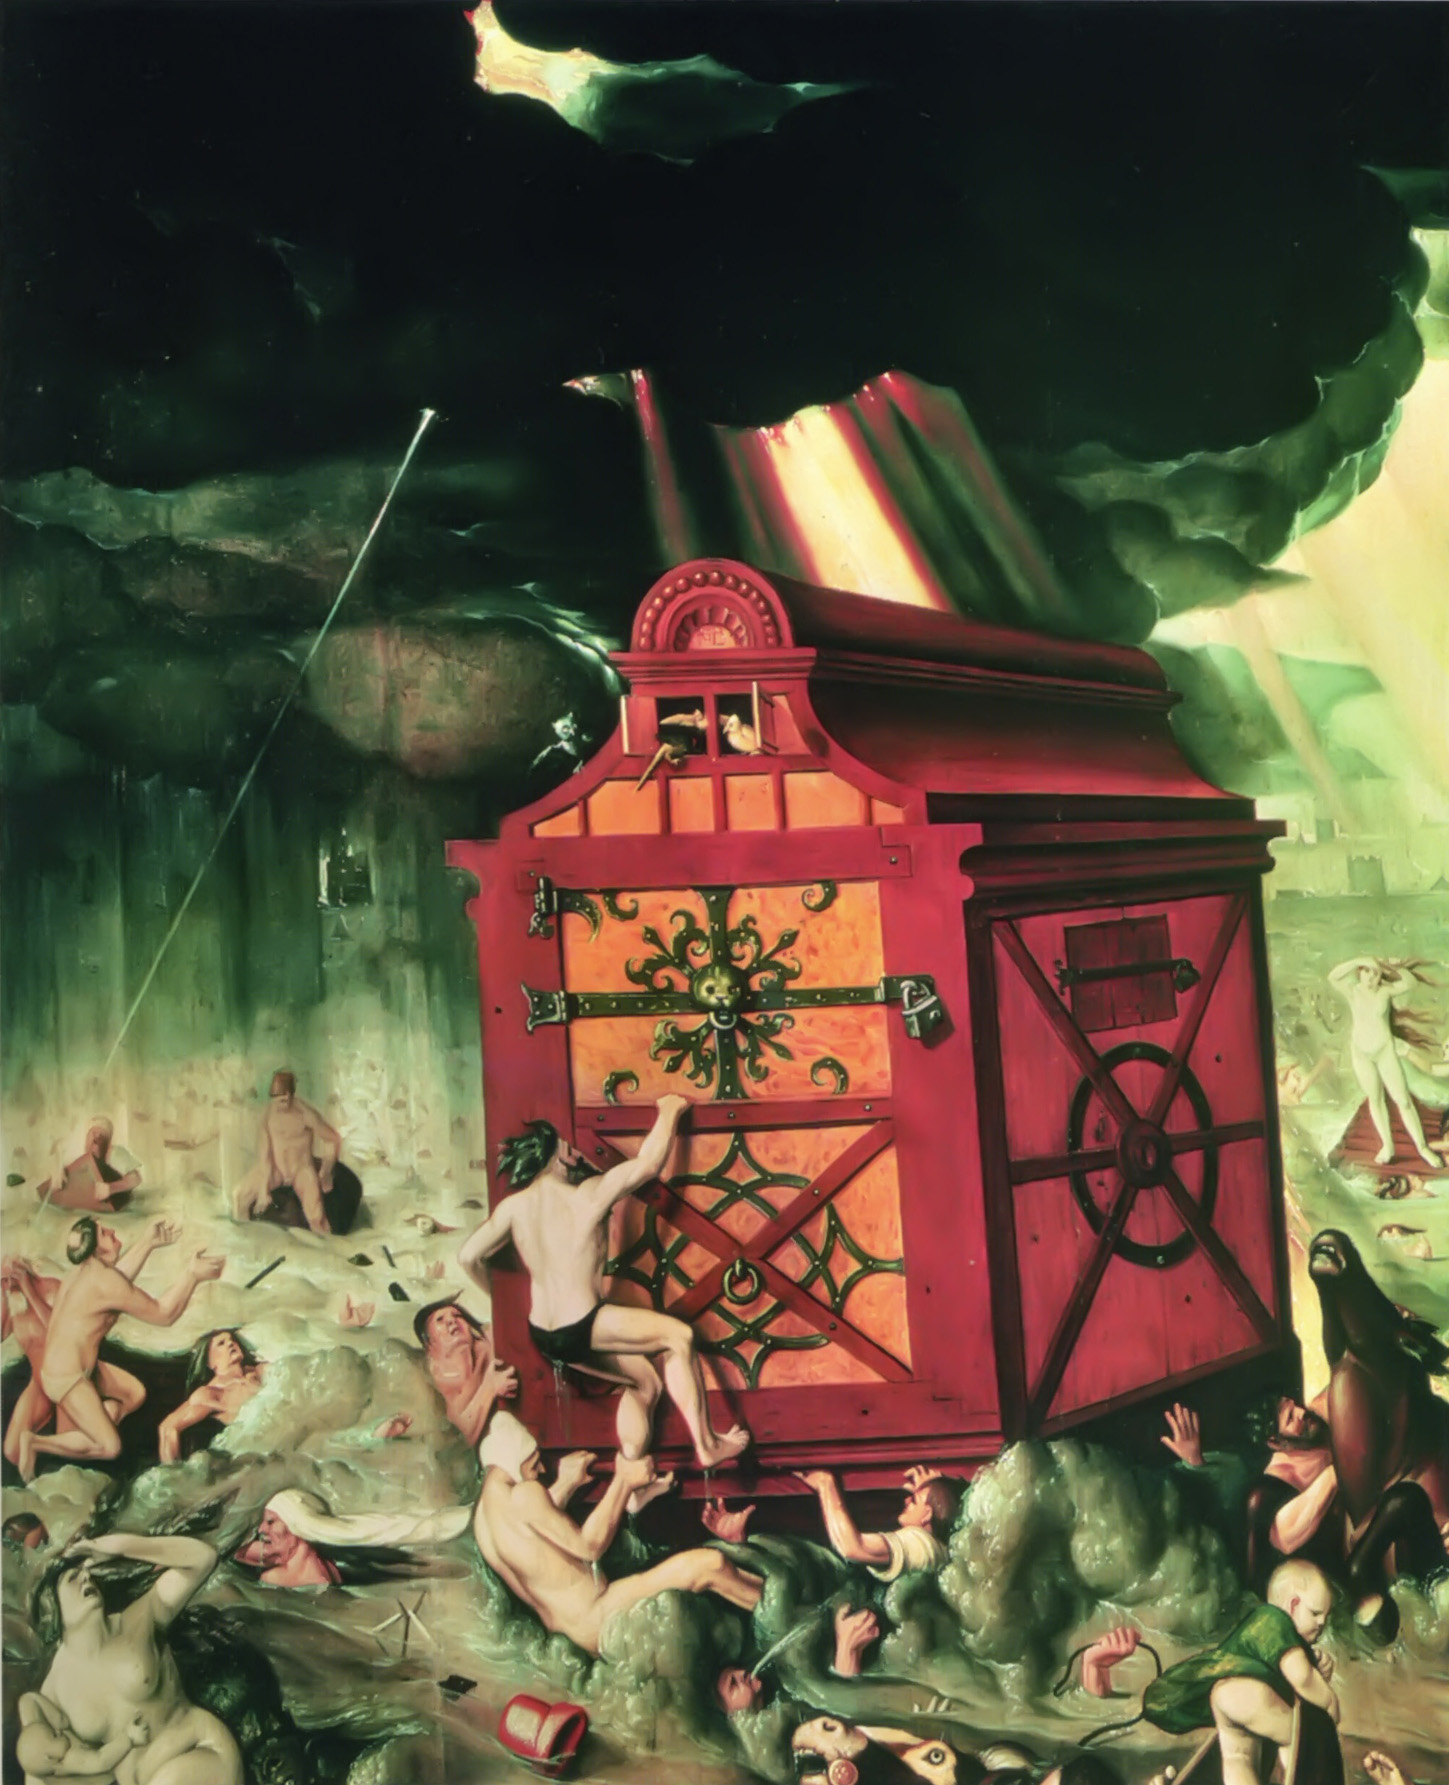 File:Baldung, Hans - Deluge - 1516.jpg - Wikimedia Commons